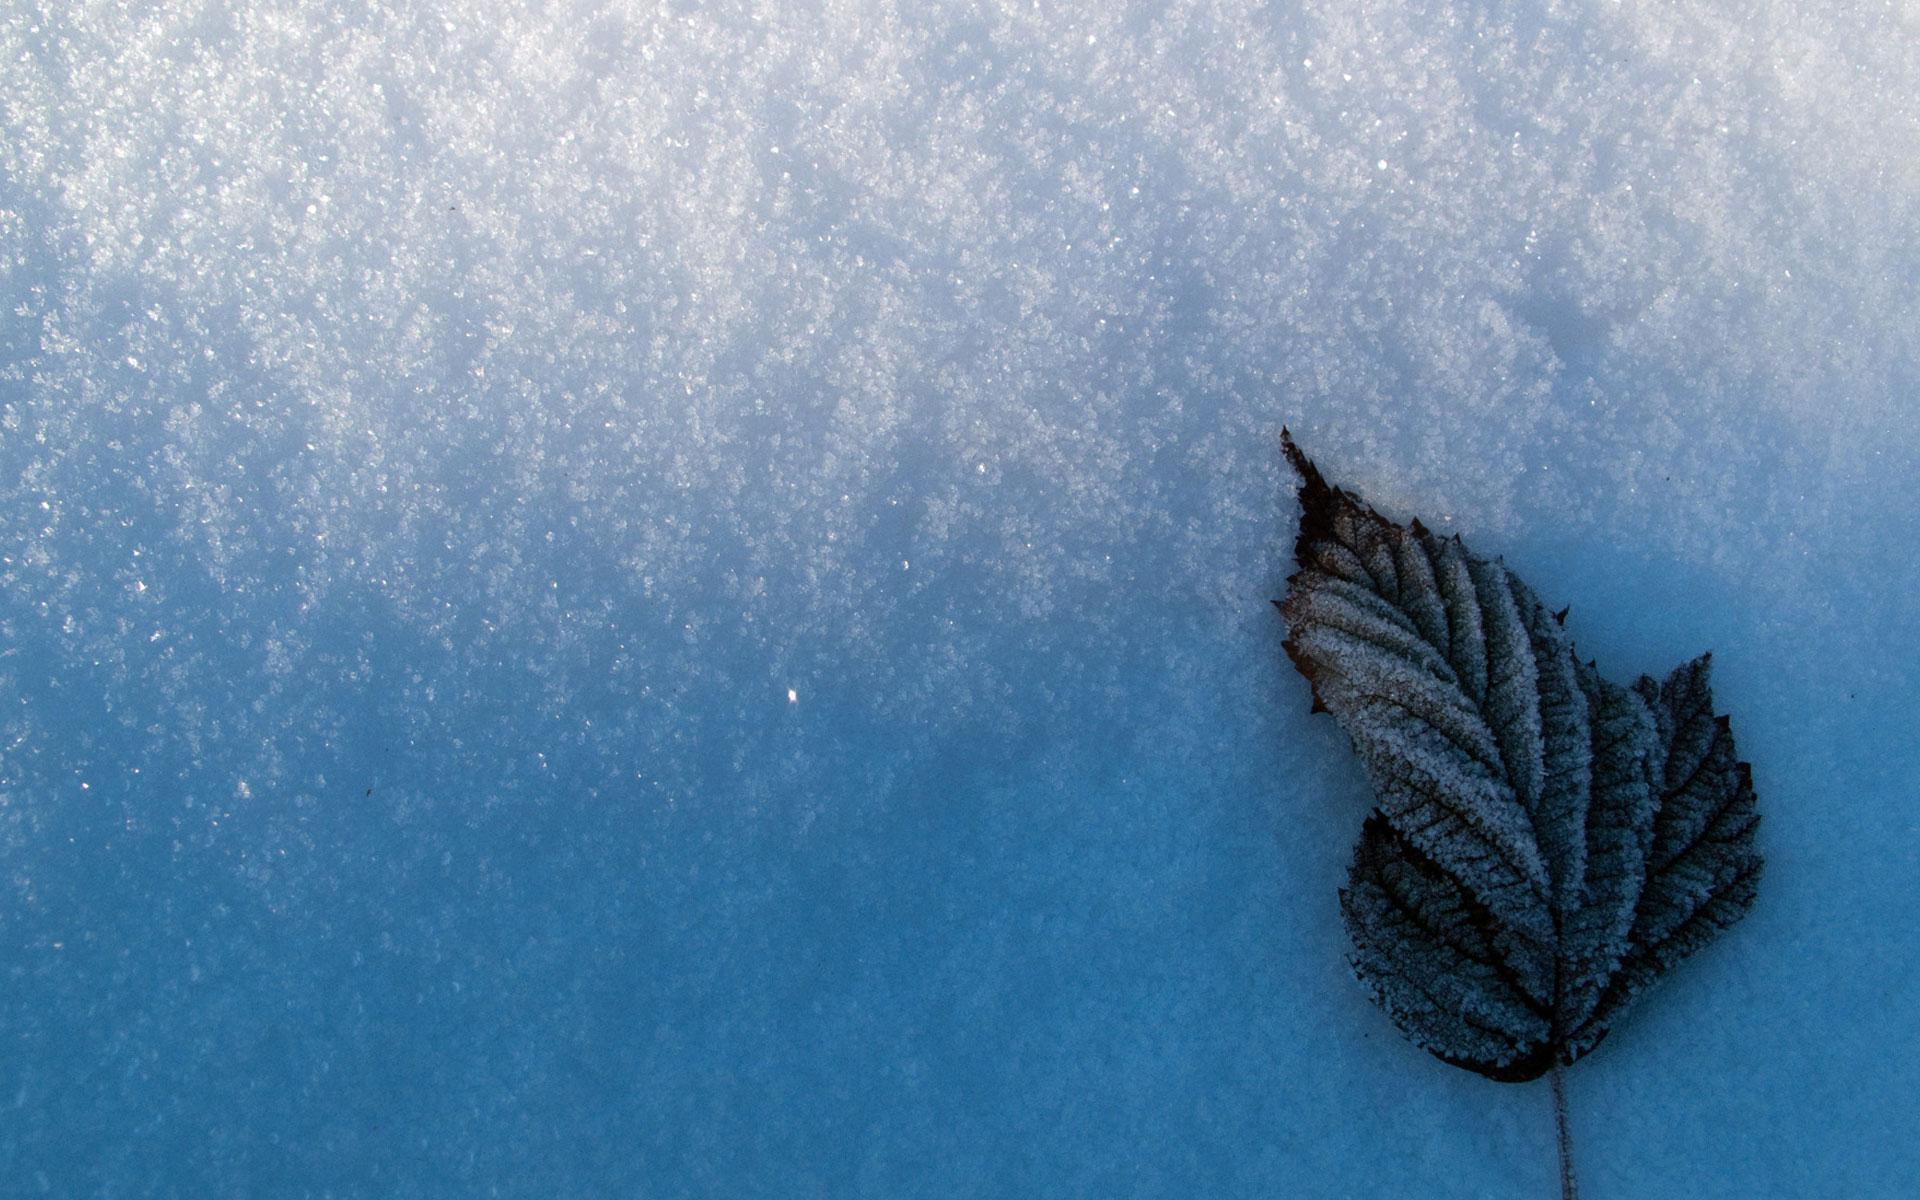 Leaf In Snow #6976715